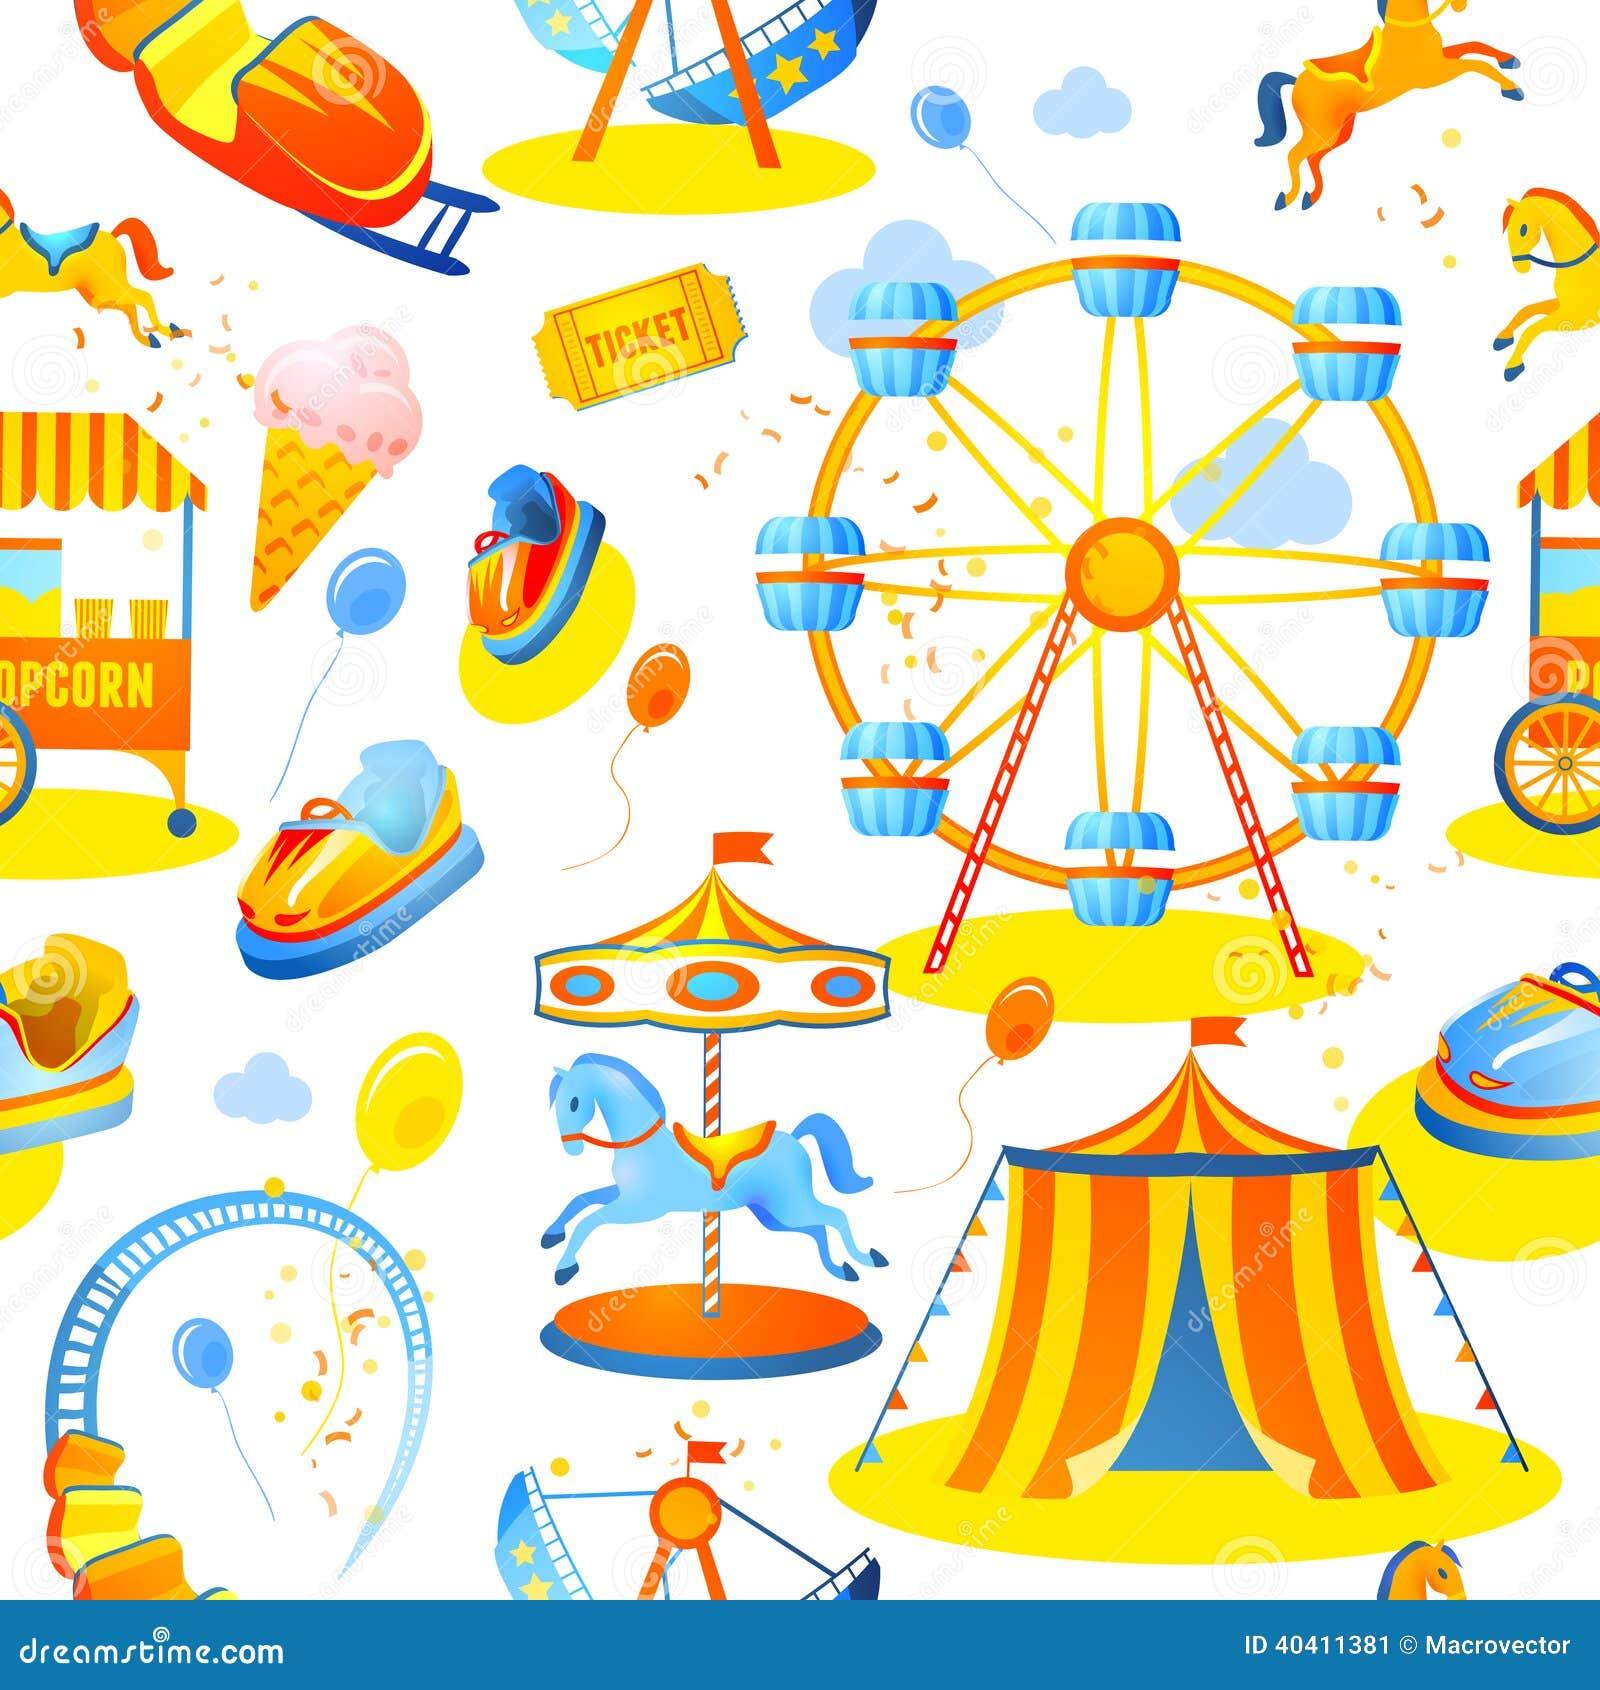 Amusement park industry essay